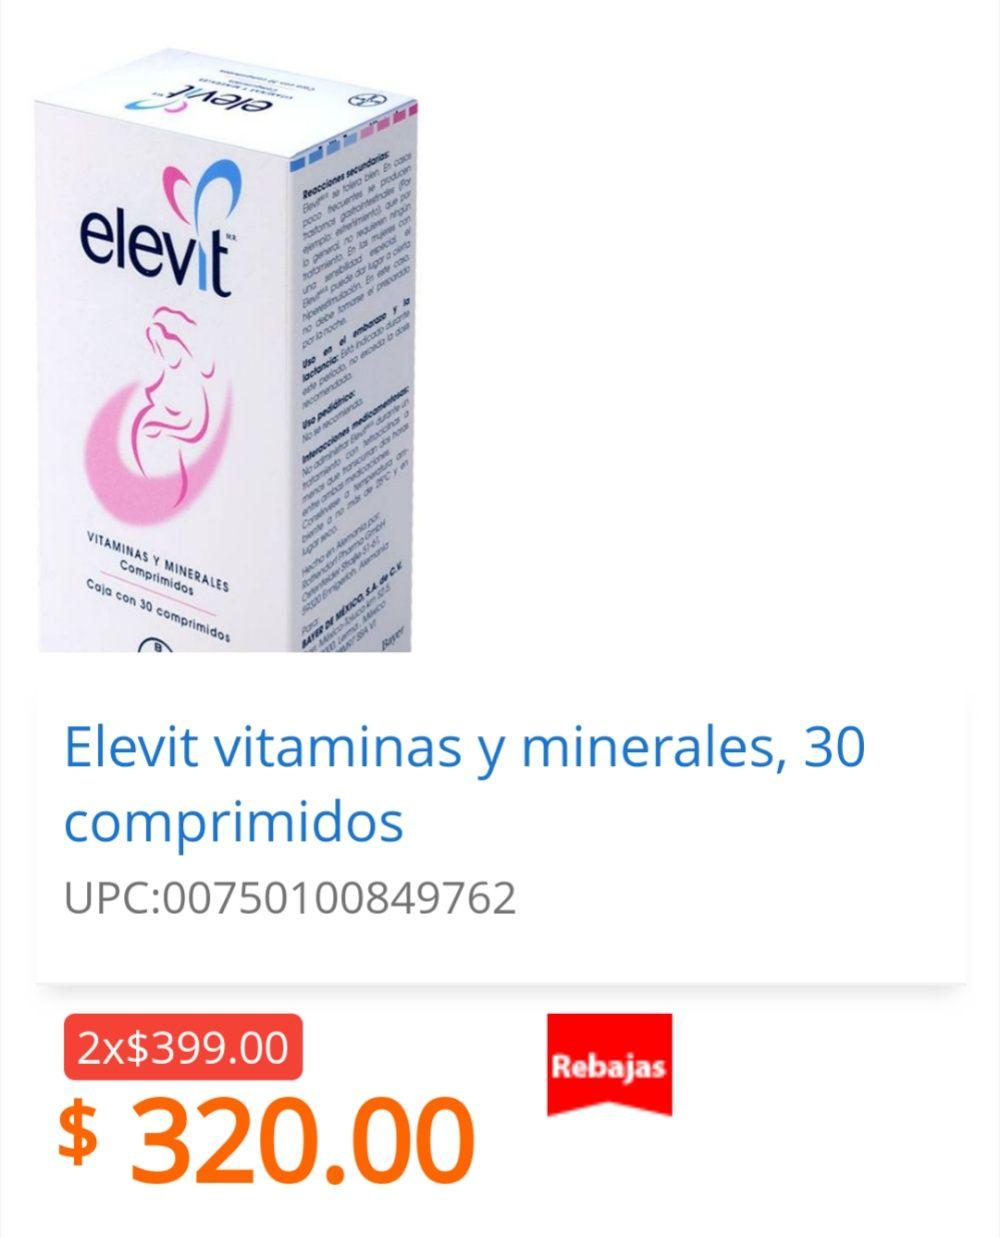 Walmart: Elevit Vitaminas 2 x $399